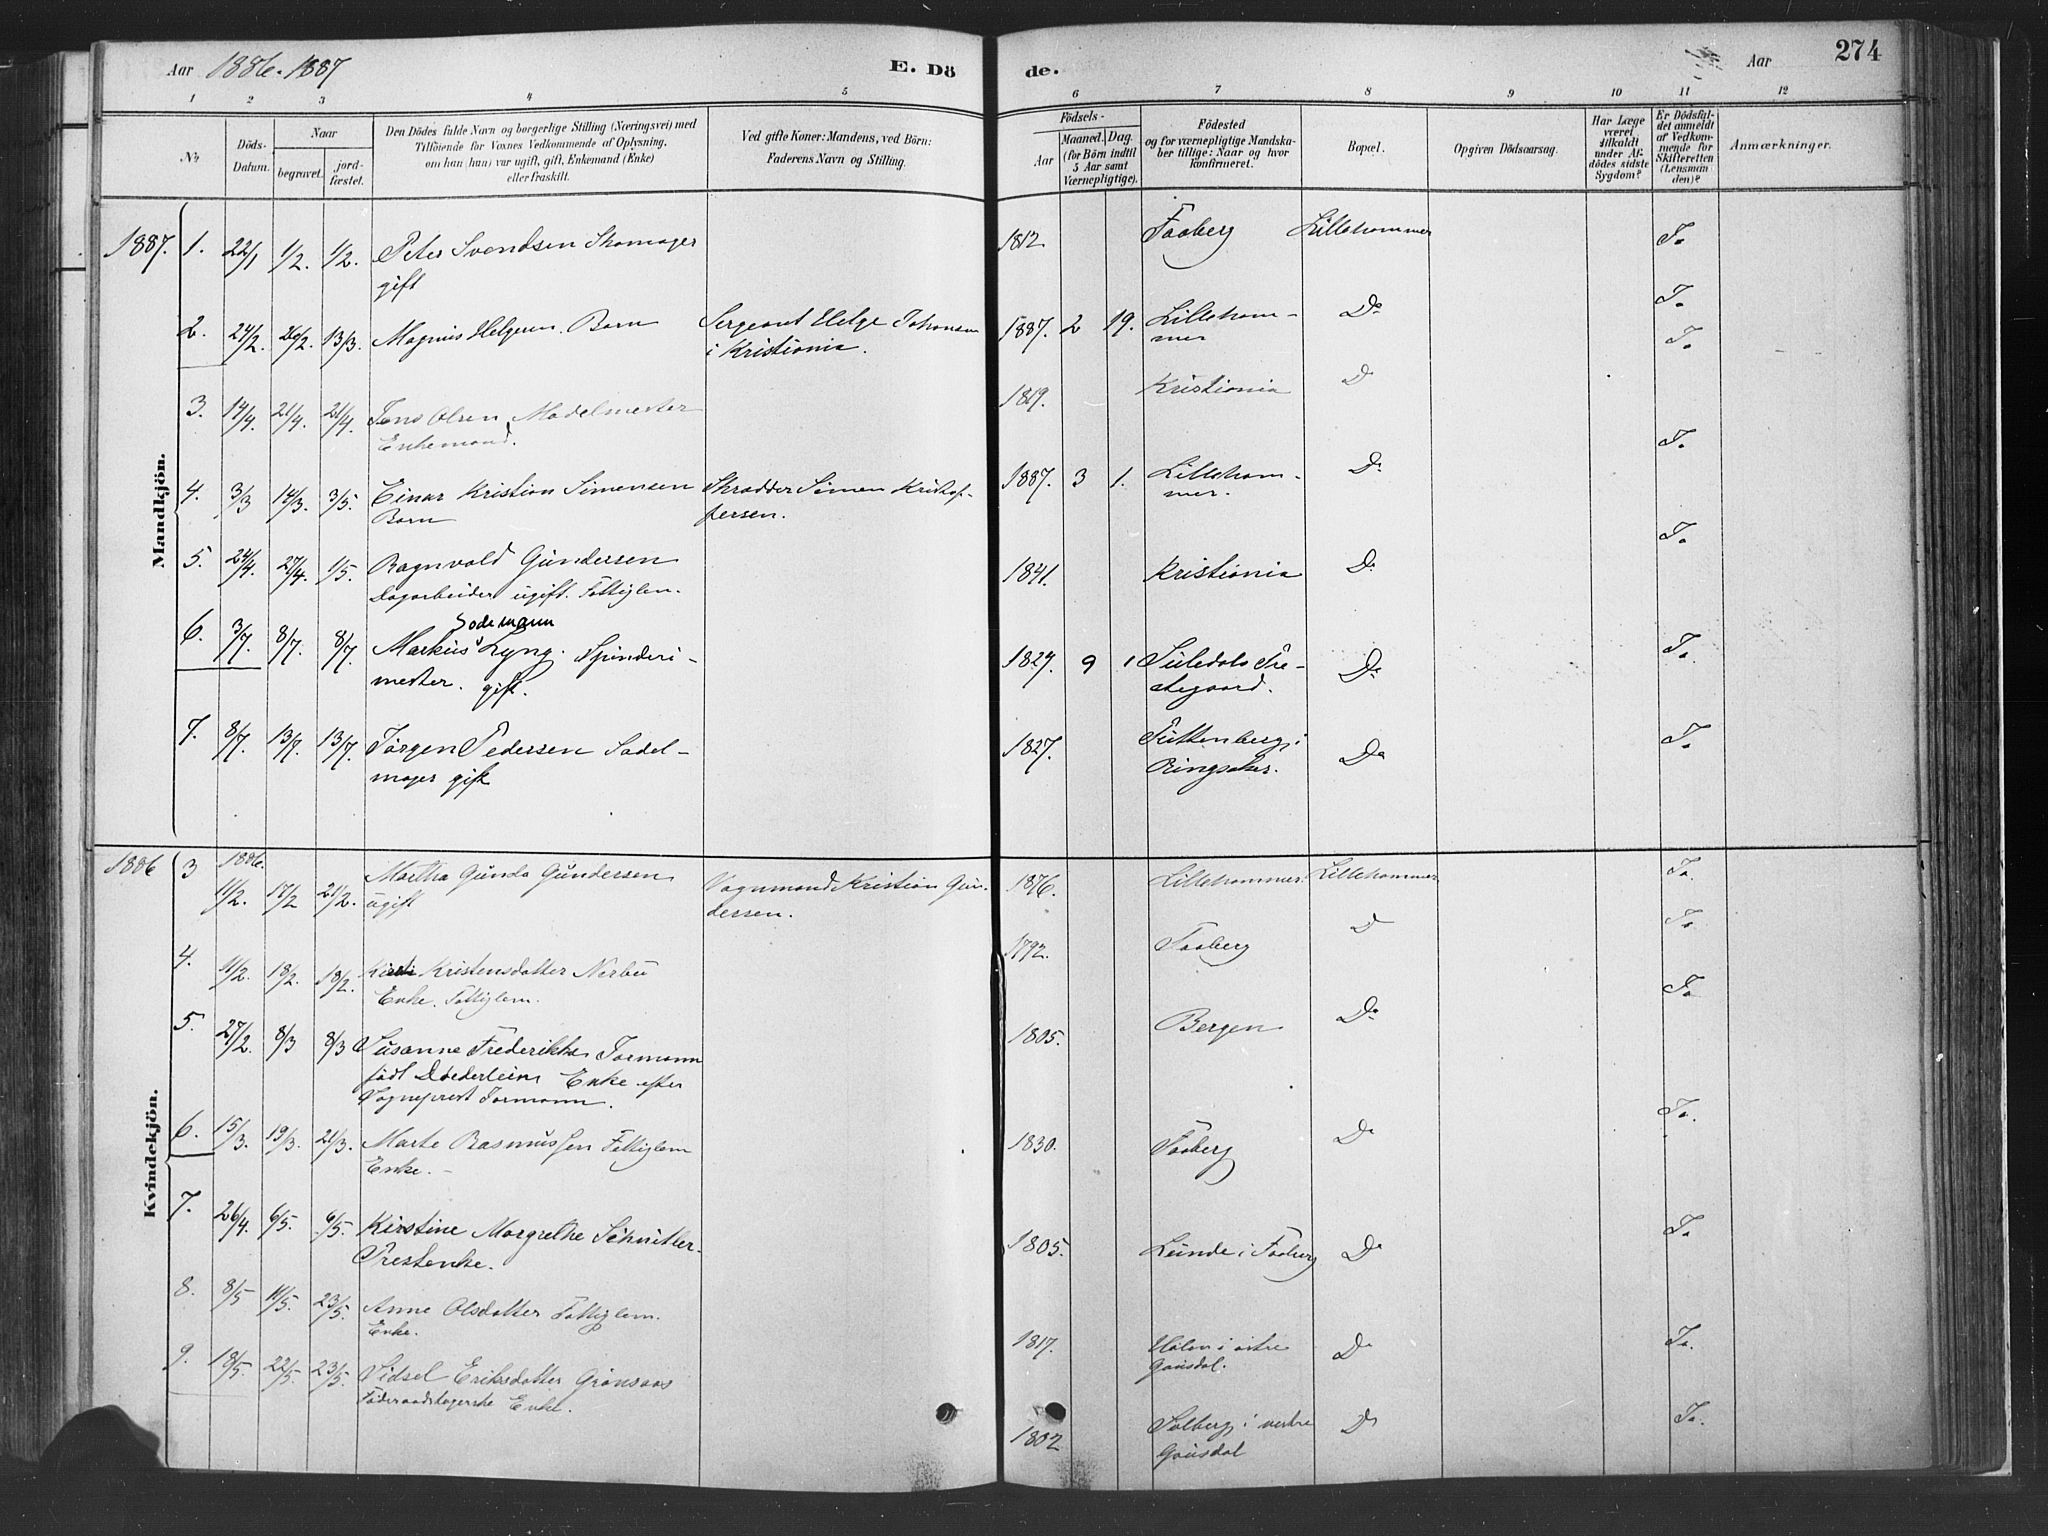 SAH, Fåberg prestekontor, Ministerialbok nr. 10, 1879-1900, s. 274